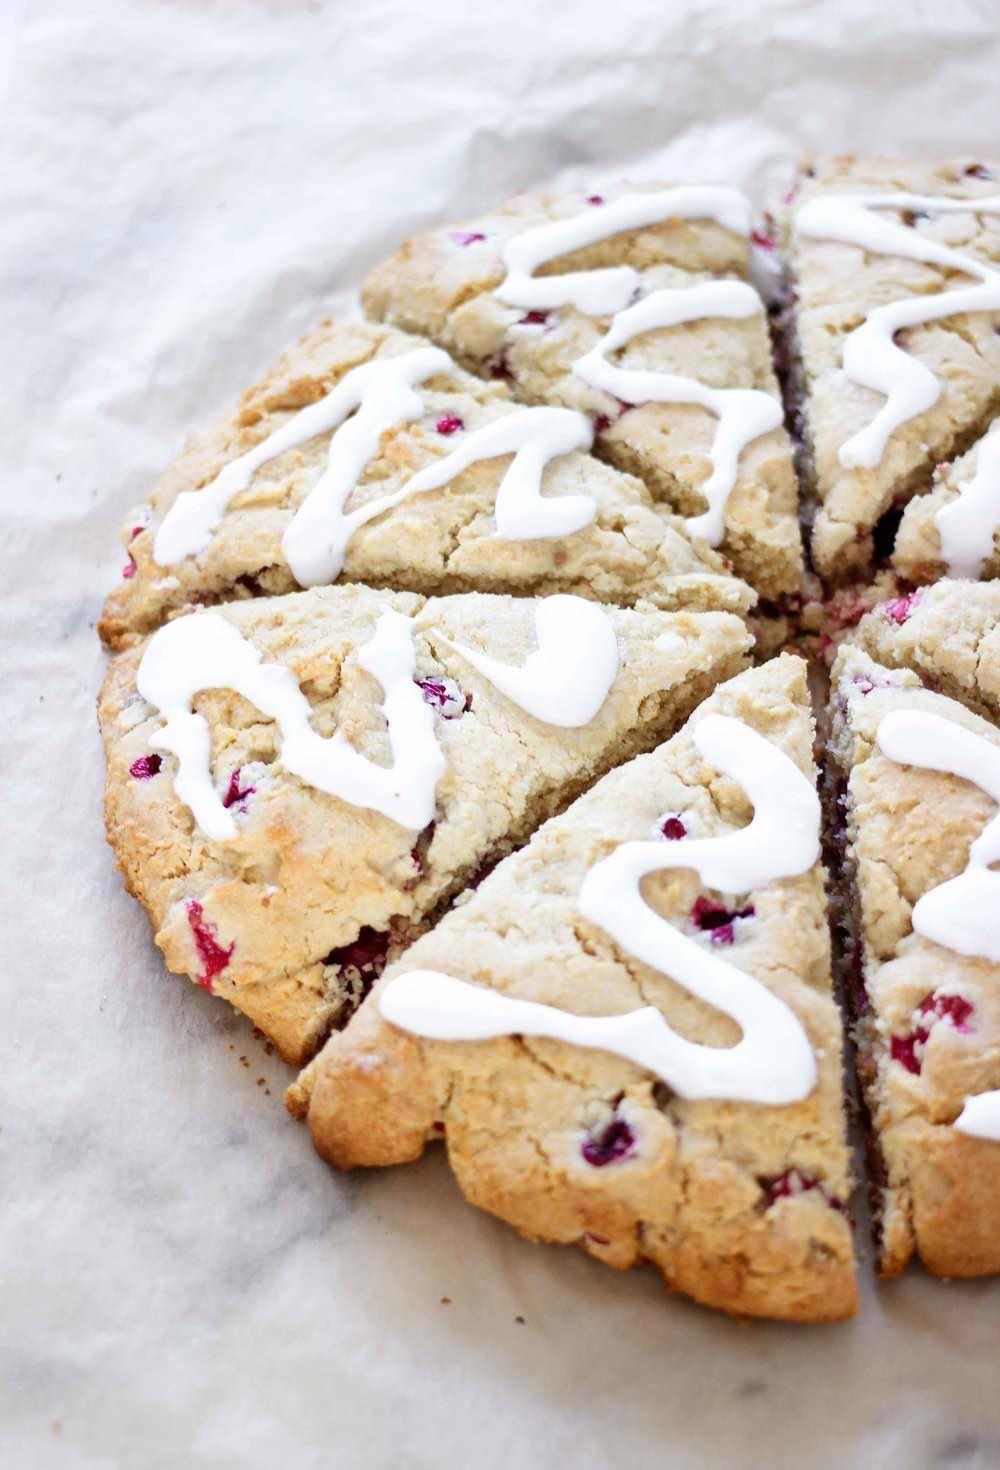 THE BEST Gluten Free Scones Recipe (Lemon Cranberry)